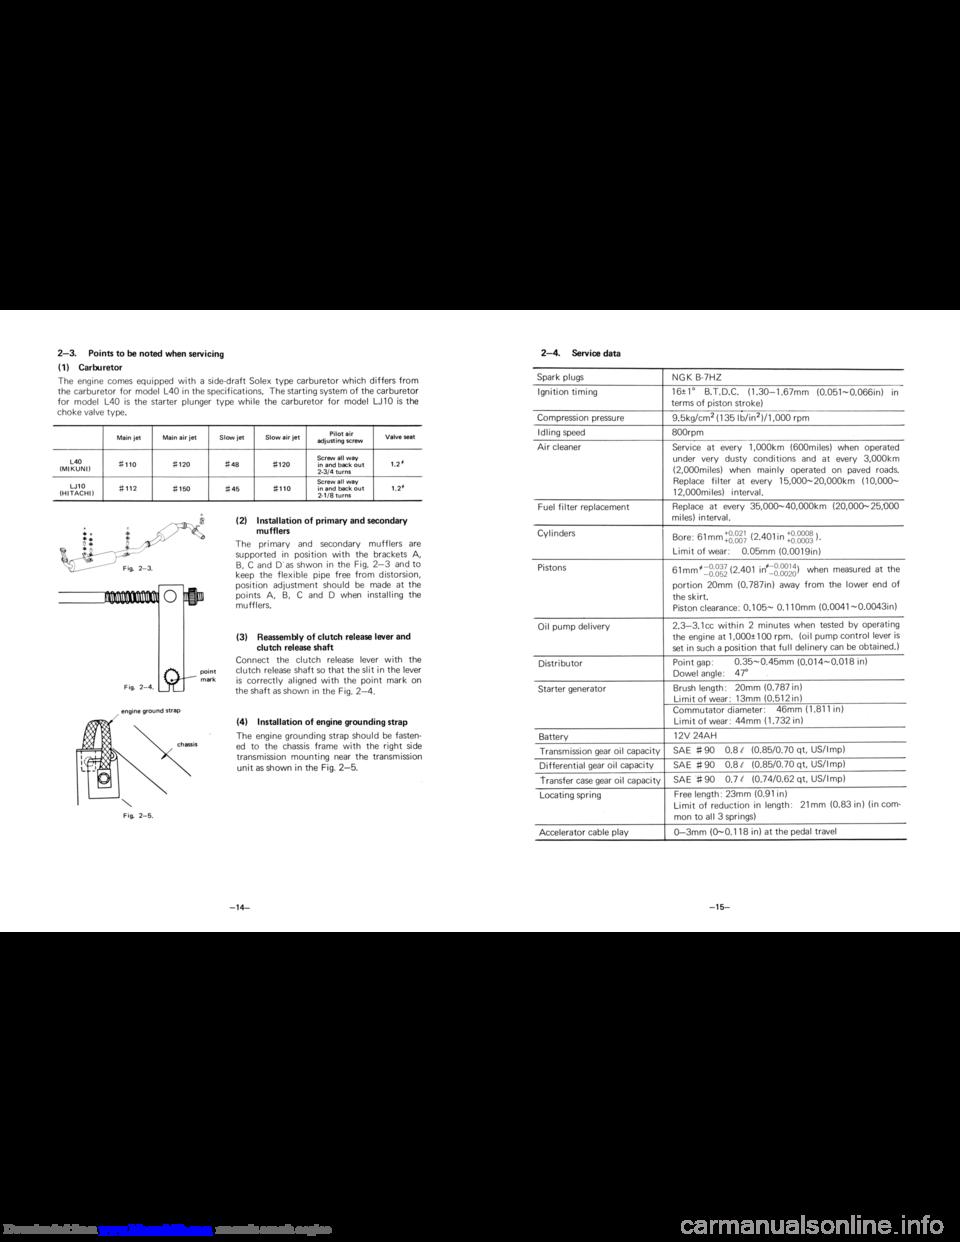 Suzuki Lj80 Workshop Manual 1979 Wiring Diagram Lj10 1973 1 G Service Lj 80 Lj20